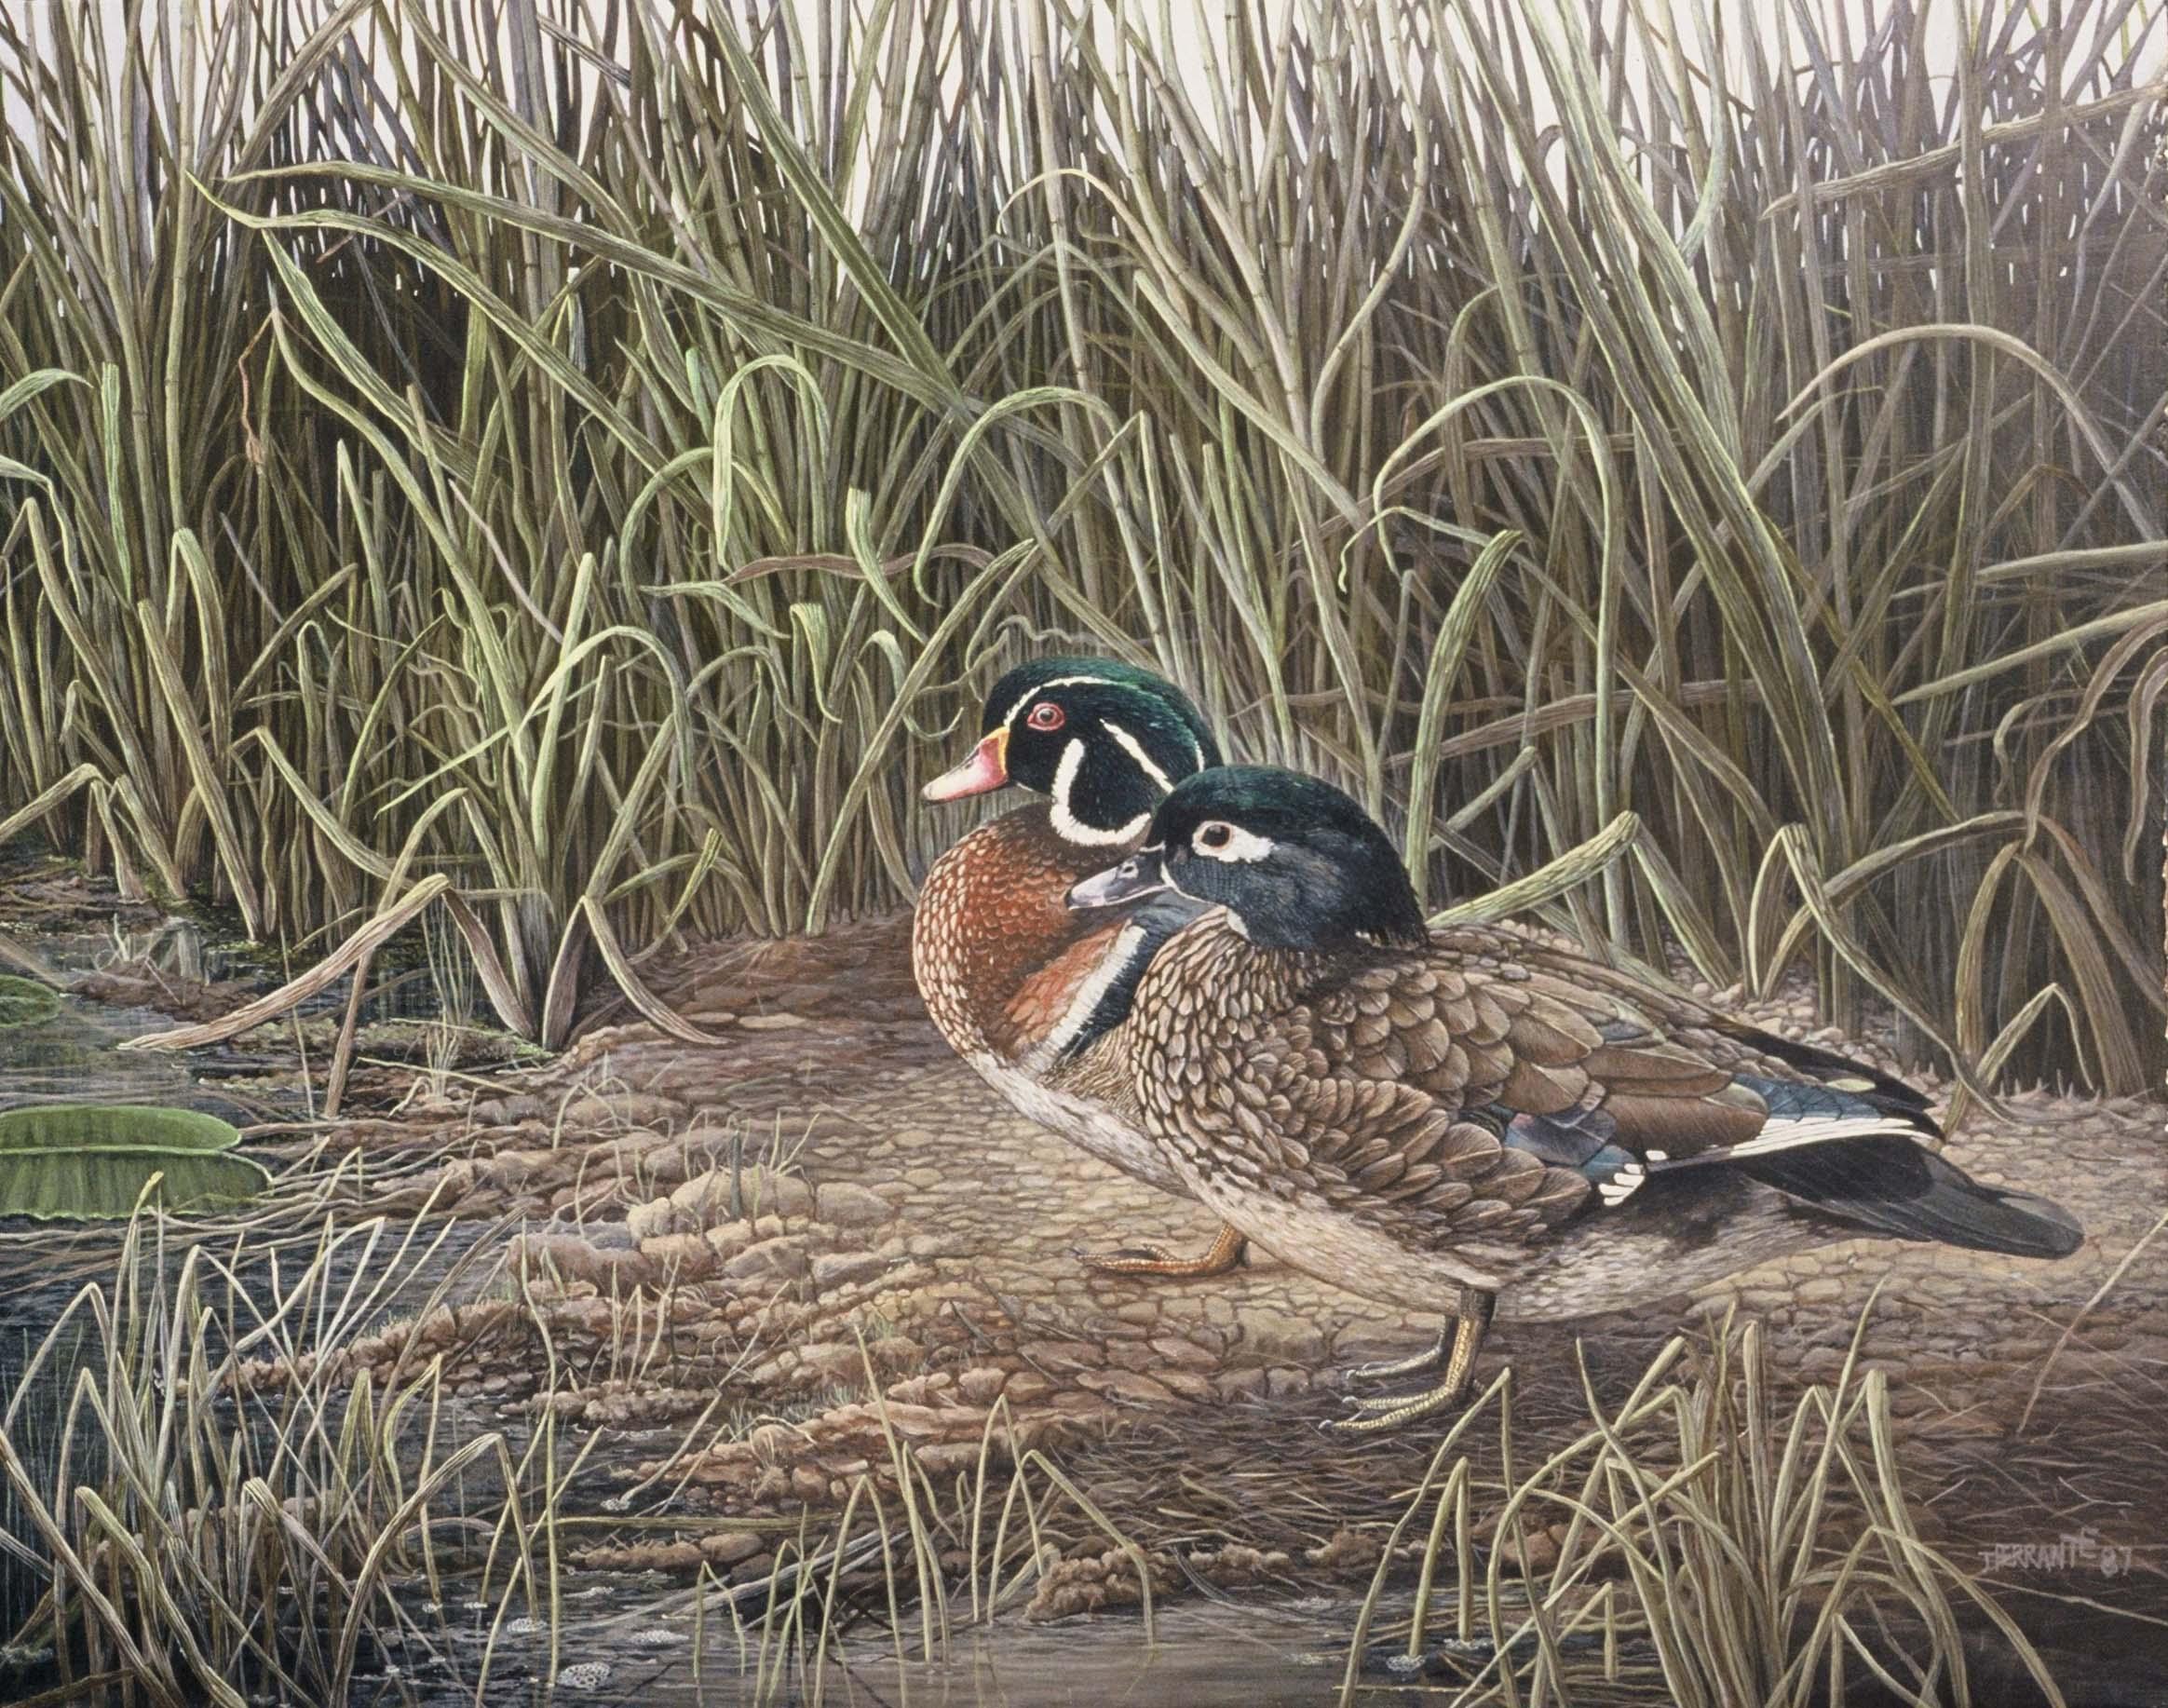 Wood ducks & reeds